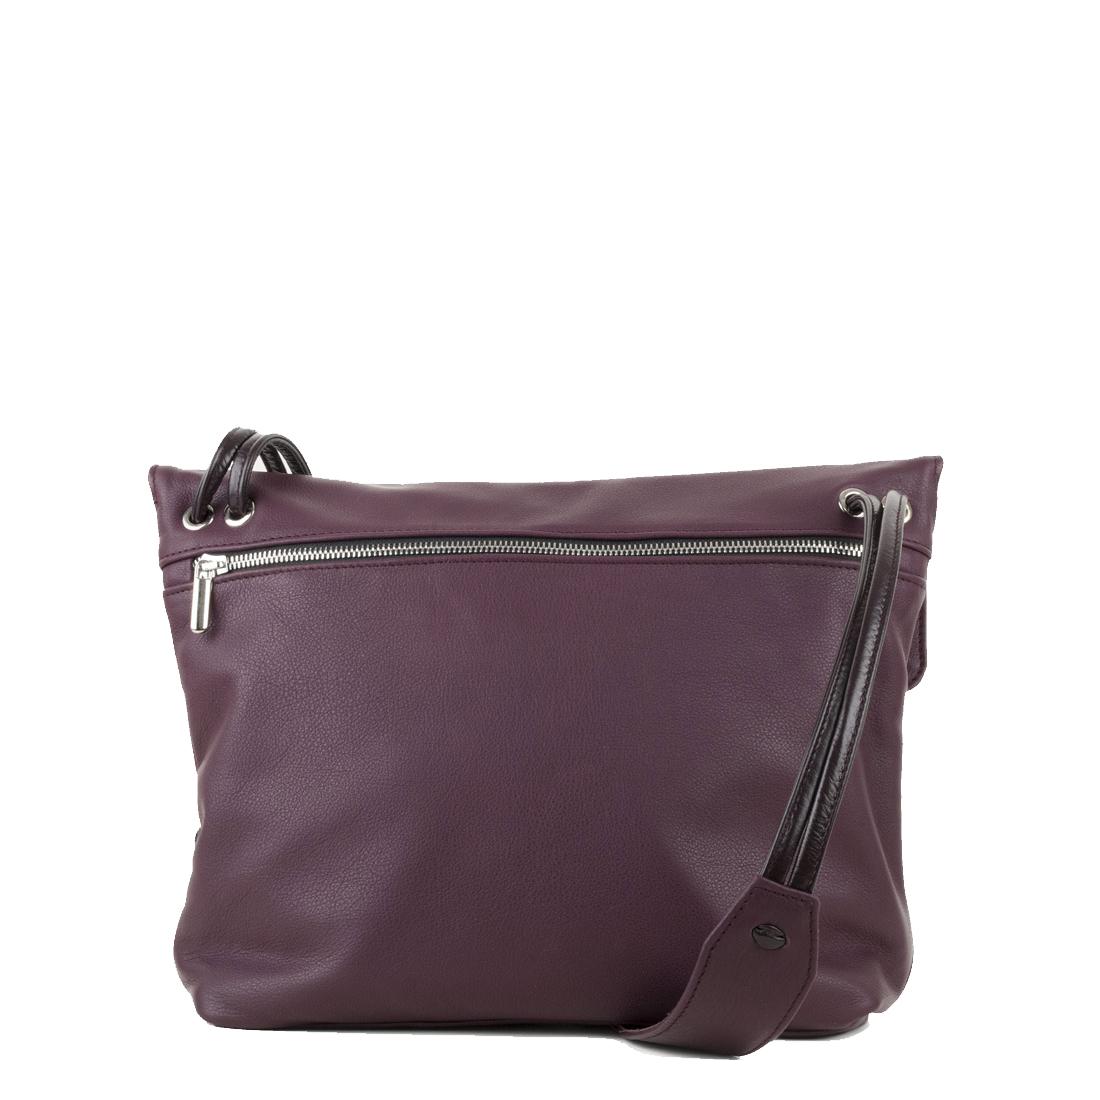 Lindsay Plum Across Body Bag